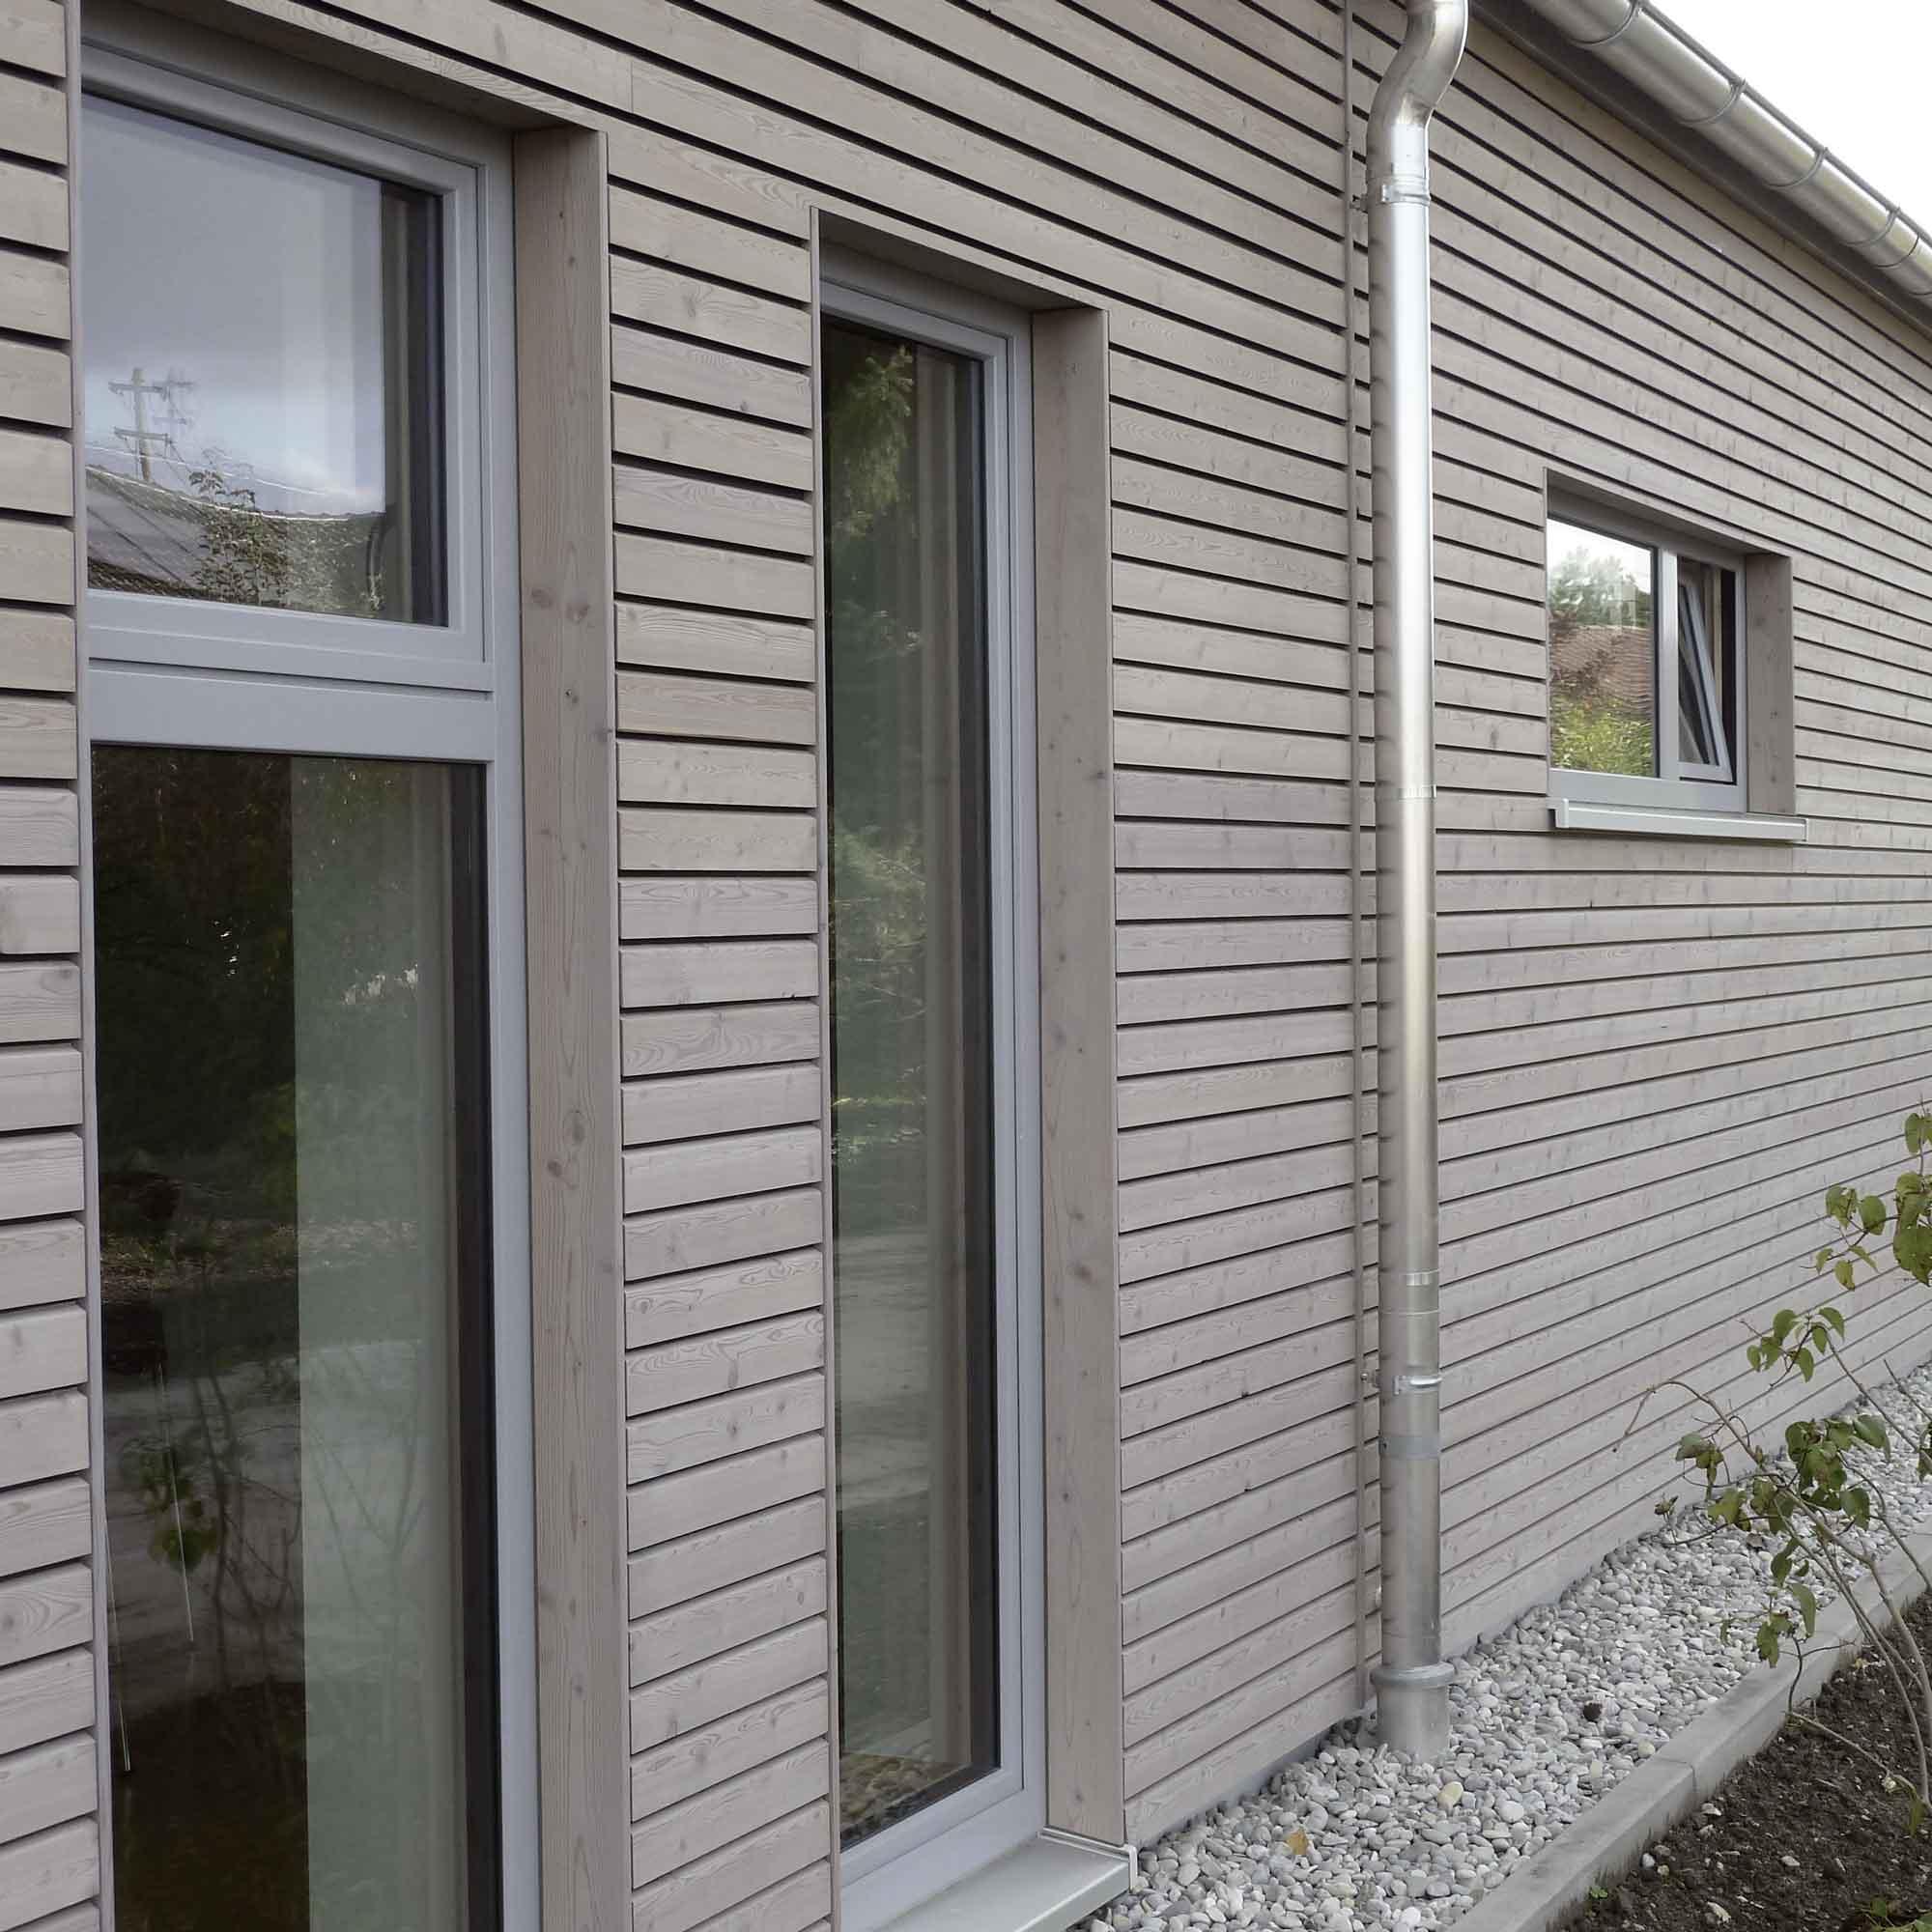 Holzfassade aus Hobelware – HolzLand Verbeek